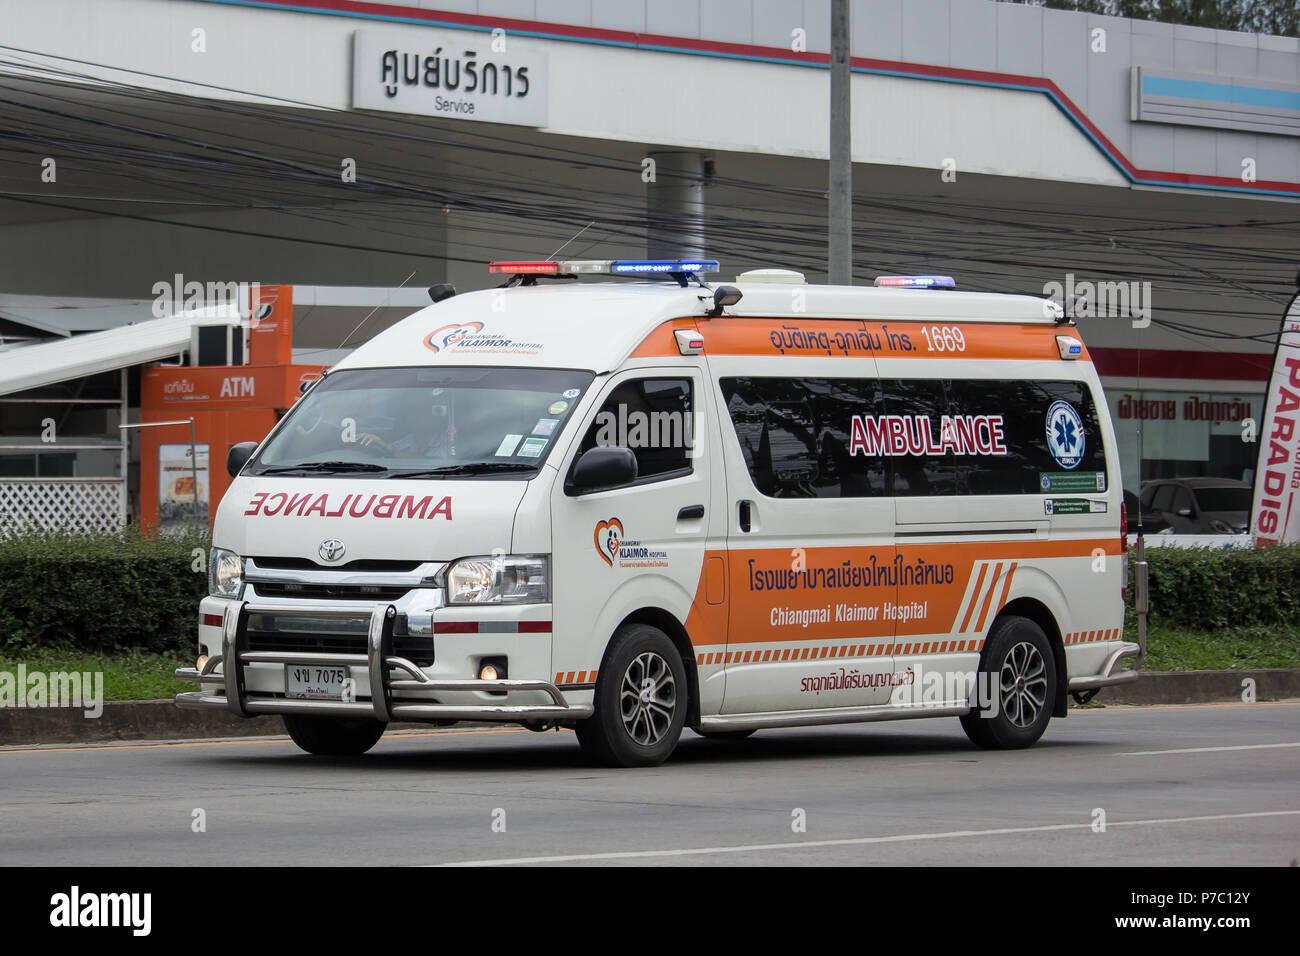 Chiangmai, Thailand - June 21 2018: Ambulance Van of Chiangmai